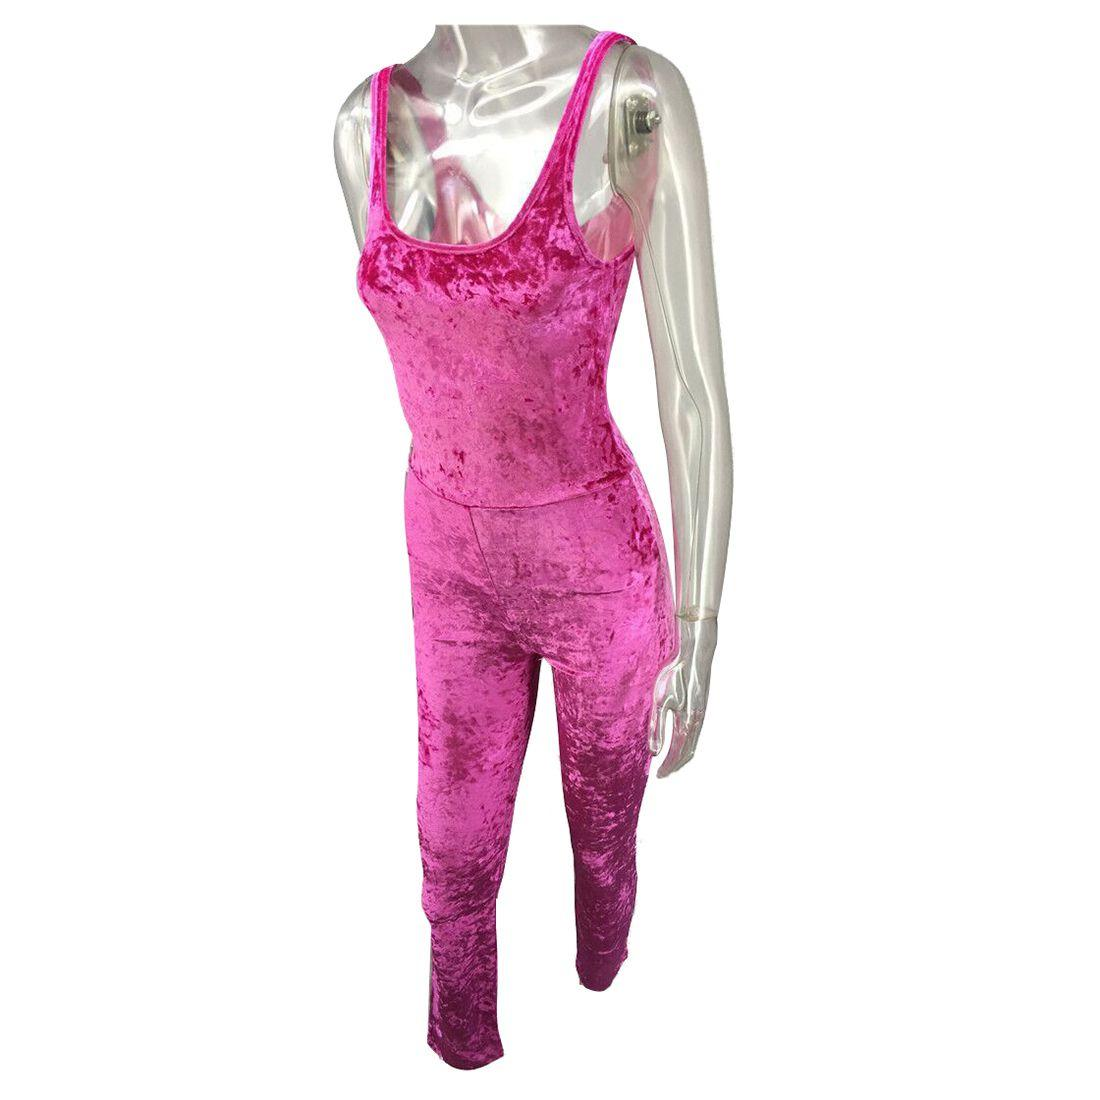 2017 KSFS Fashion Women's velvet sexy sleeveless Jumpsuits BLACK Pink Purple Khaki